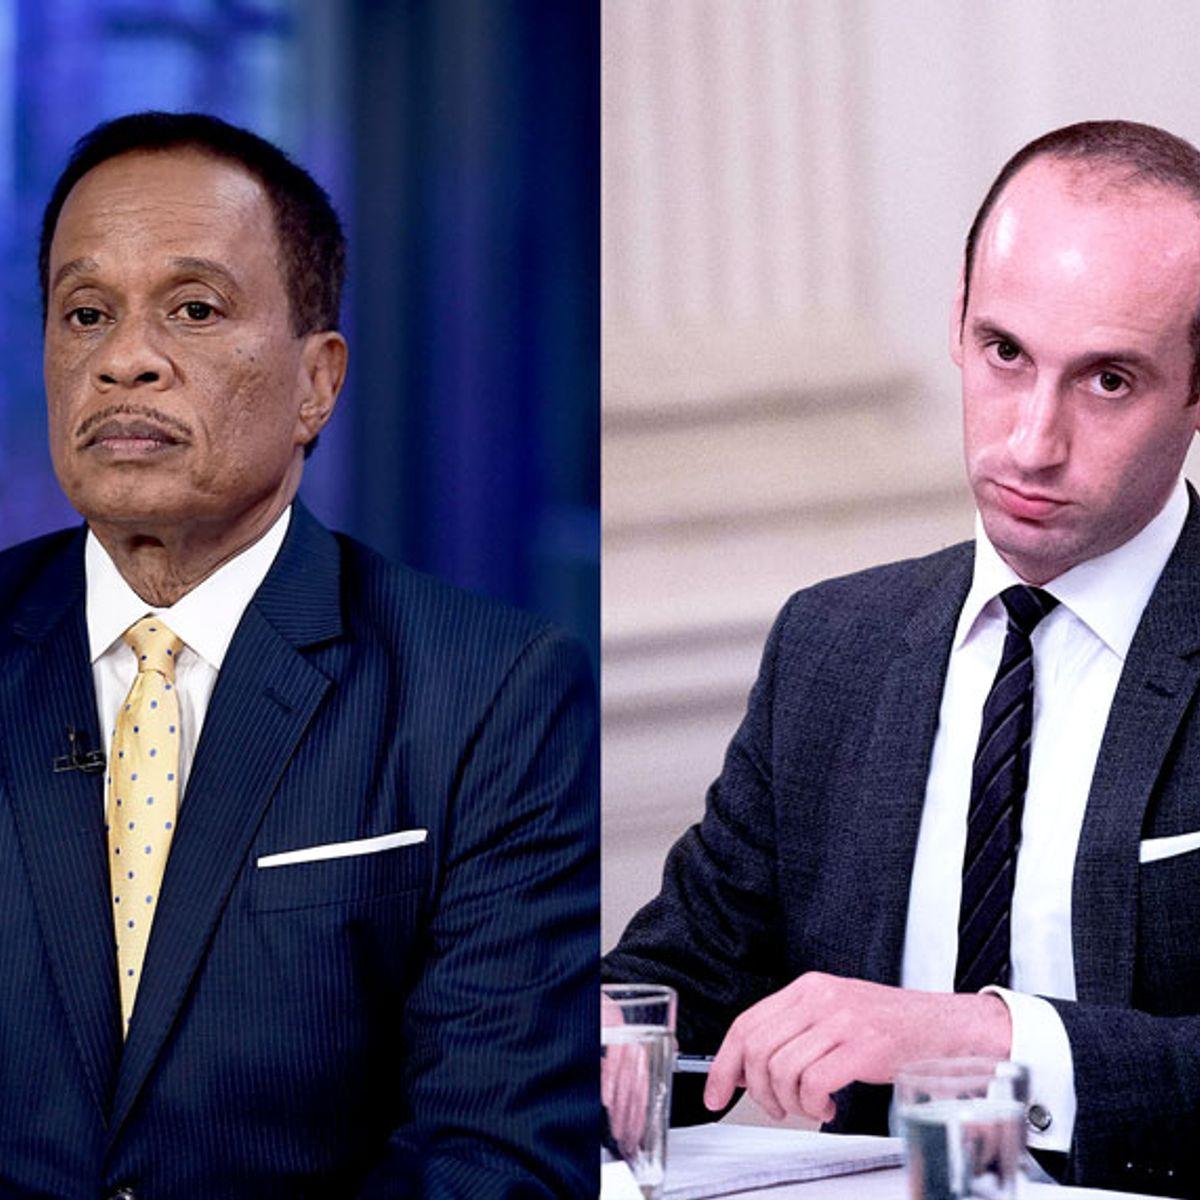 Fox News host Juan Williams calls on President Trump to fire Stephen Miller